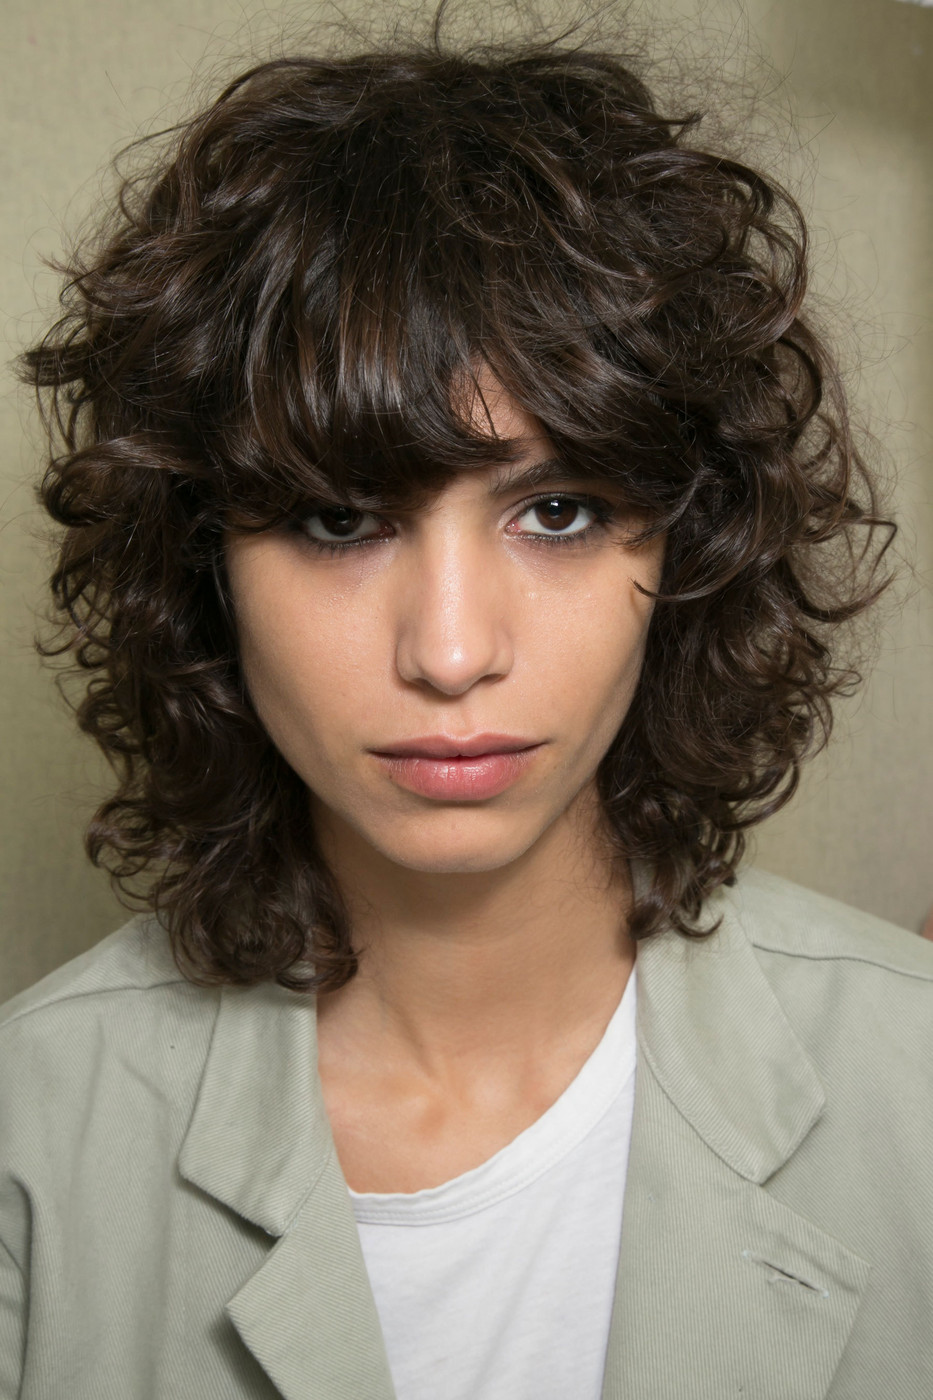 Стрижка на средние волосы 2018 подборка